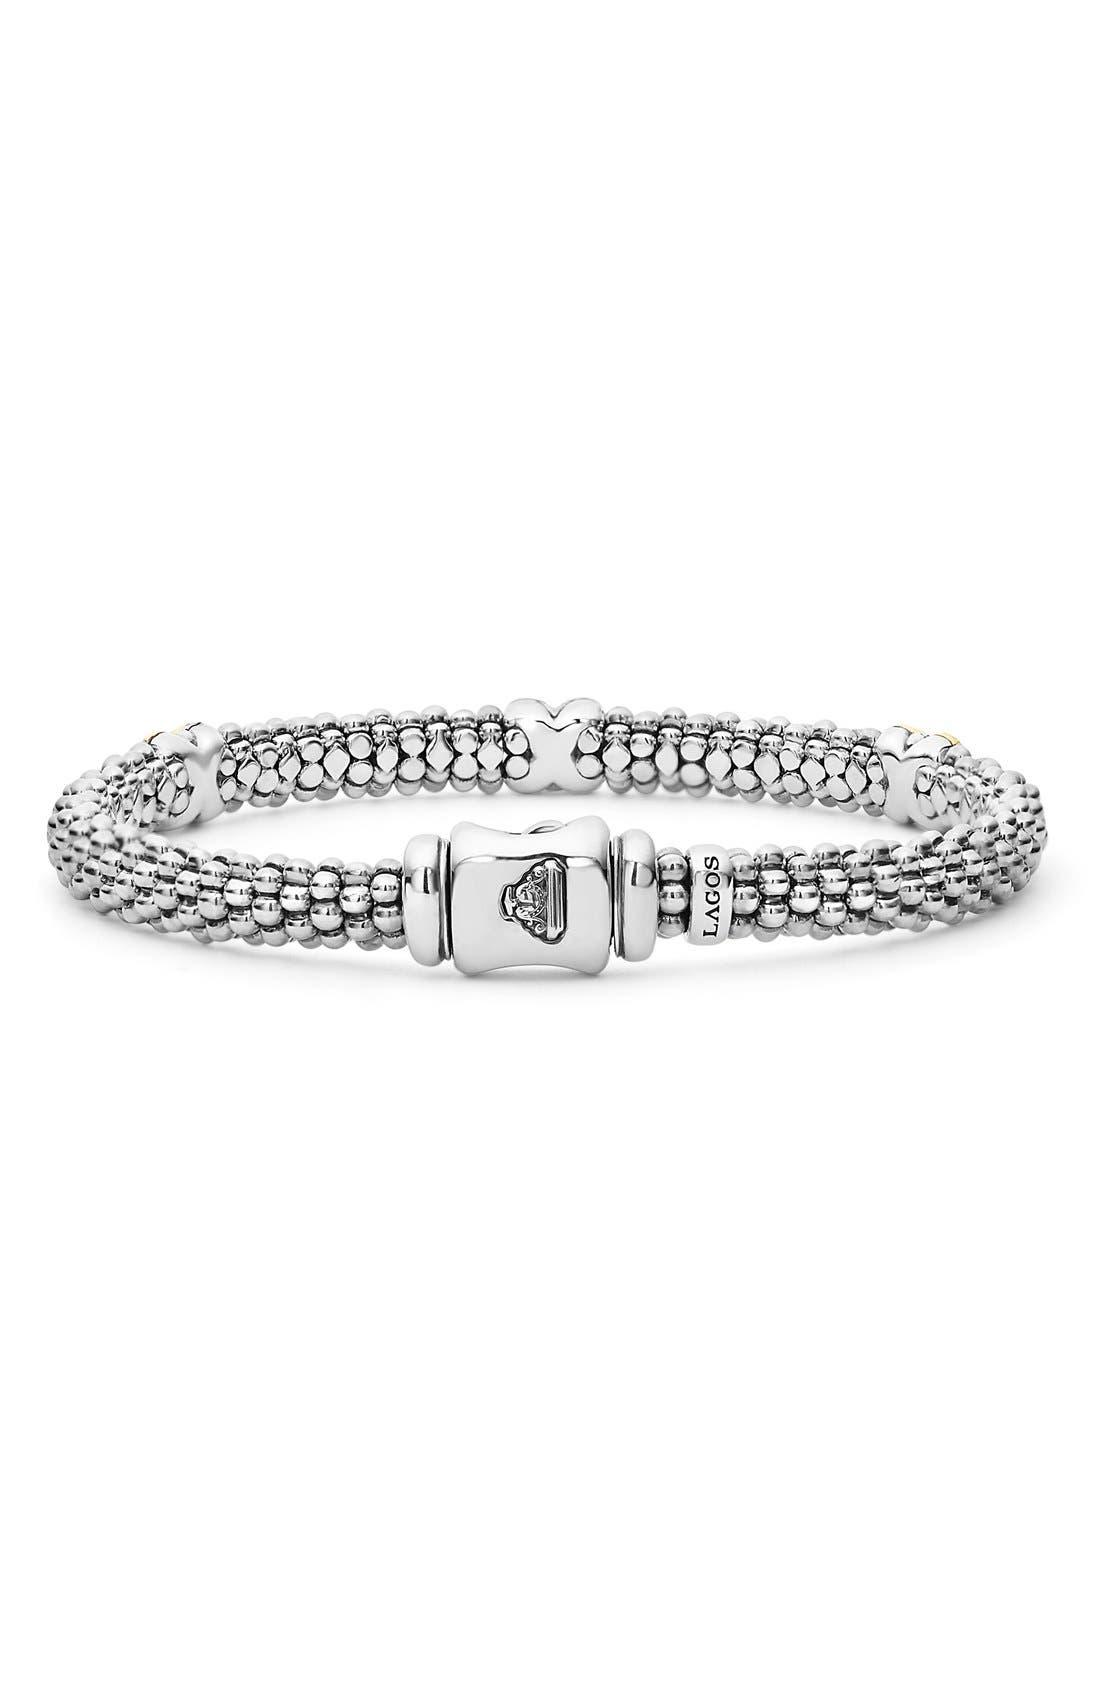 'Signature Caviar' Diamond Rope Bracelet,                             Alternate thumbnail 4, color,                             SILVER/ GOLD